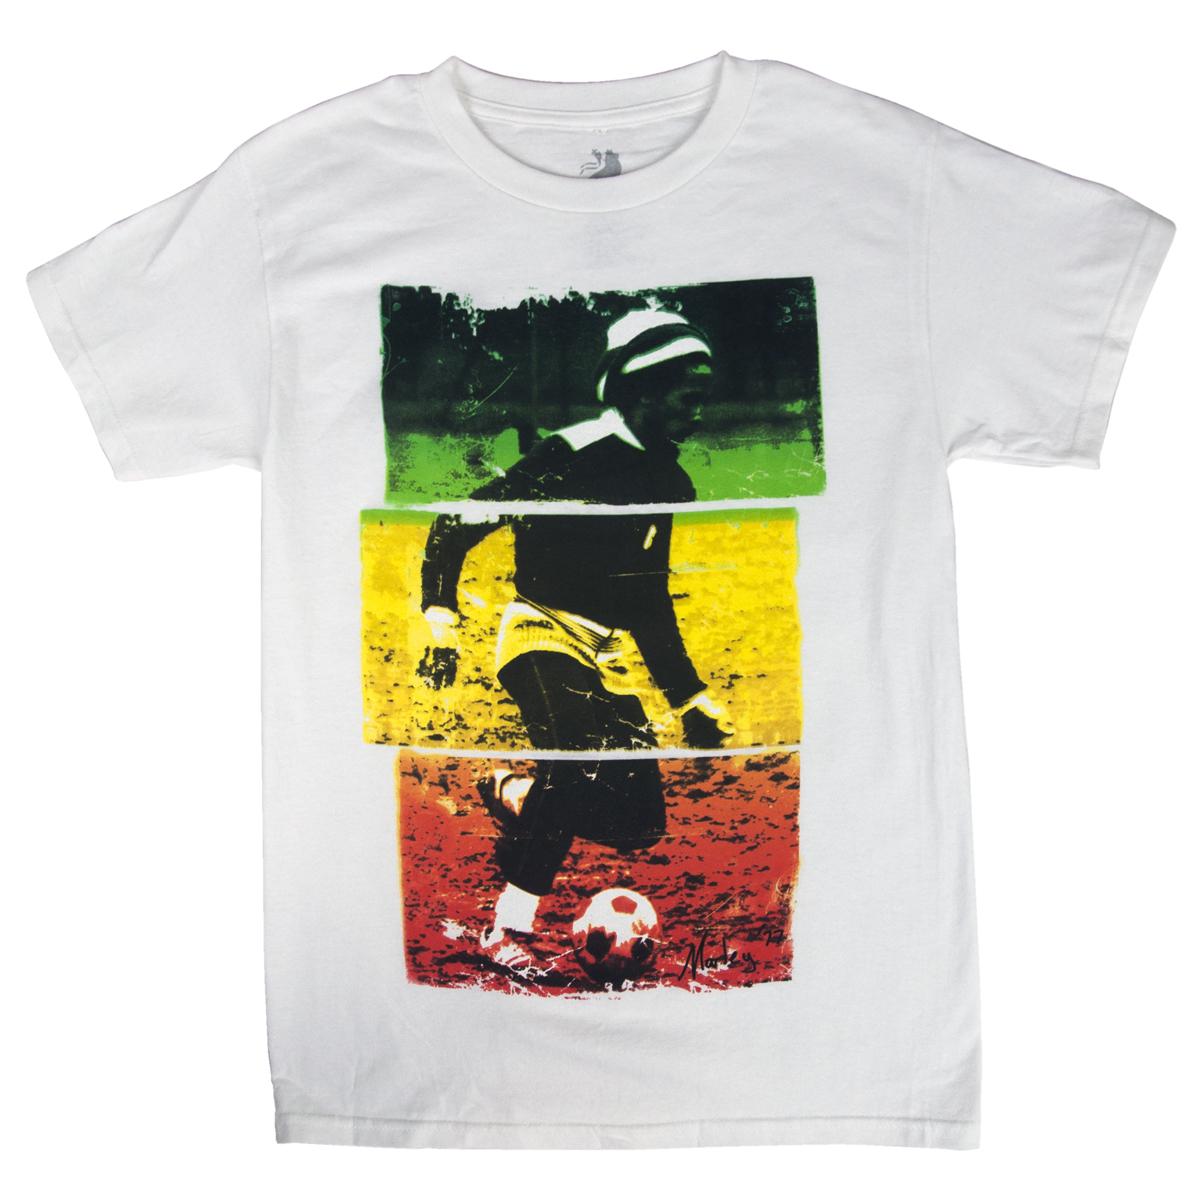 Bob Marley Soccer 77 Rasta Tri-Color White T-Shirt - Men's